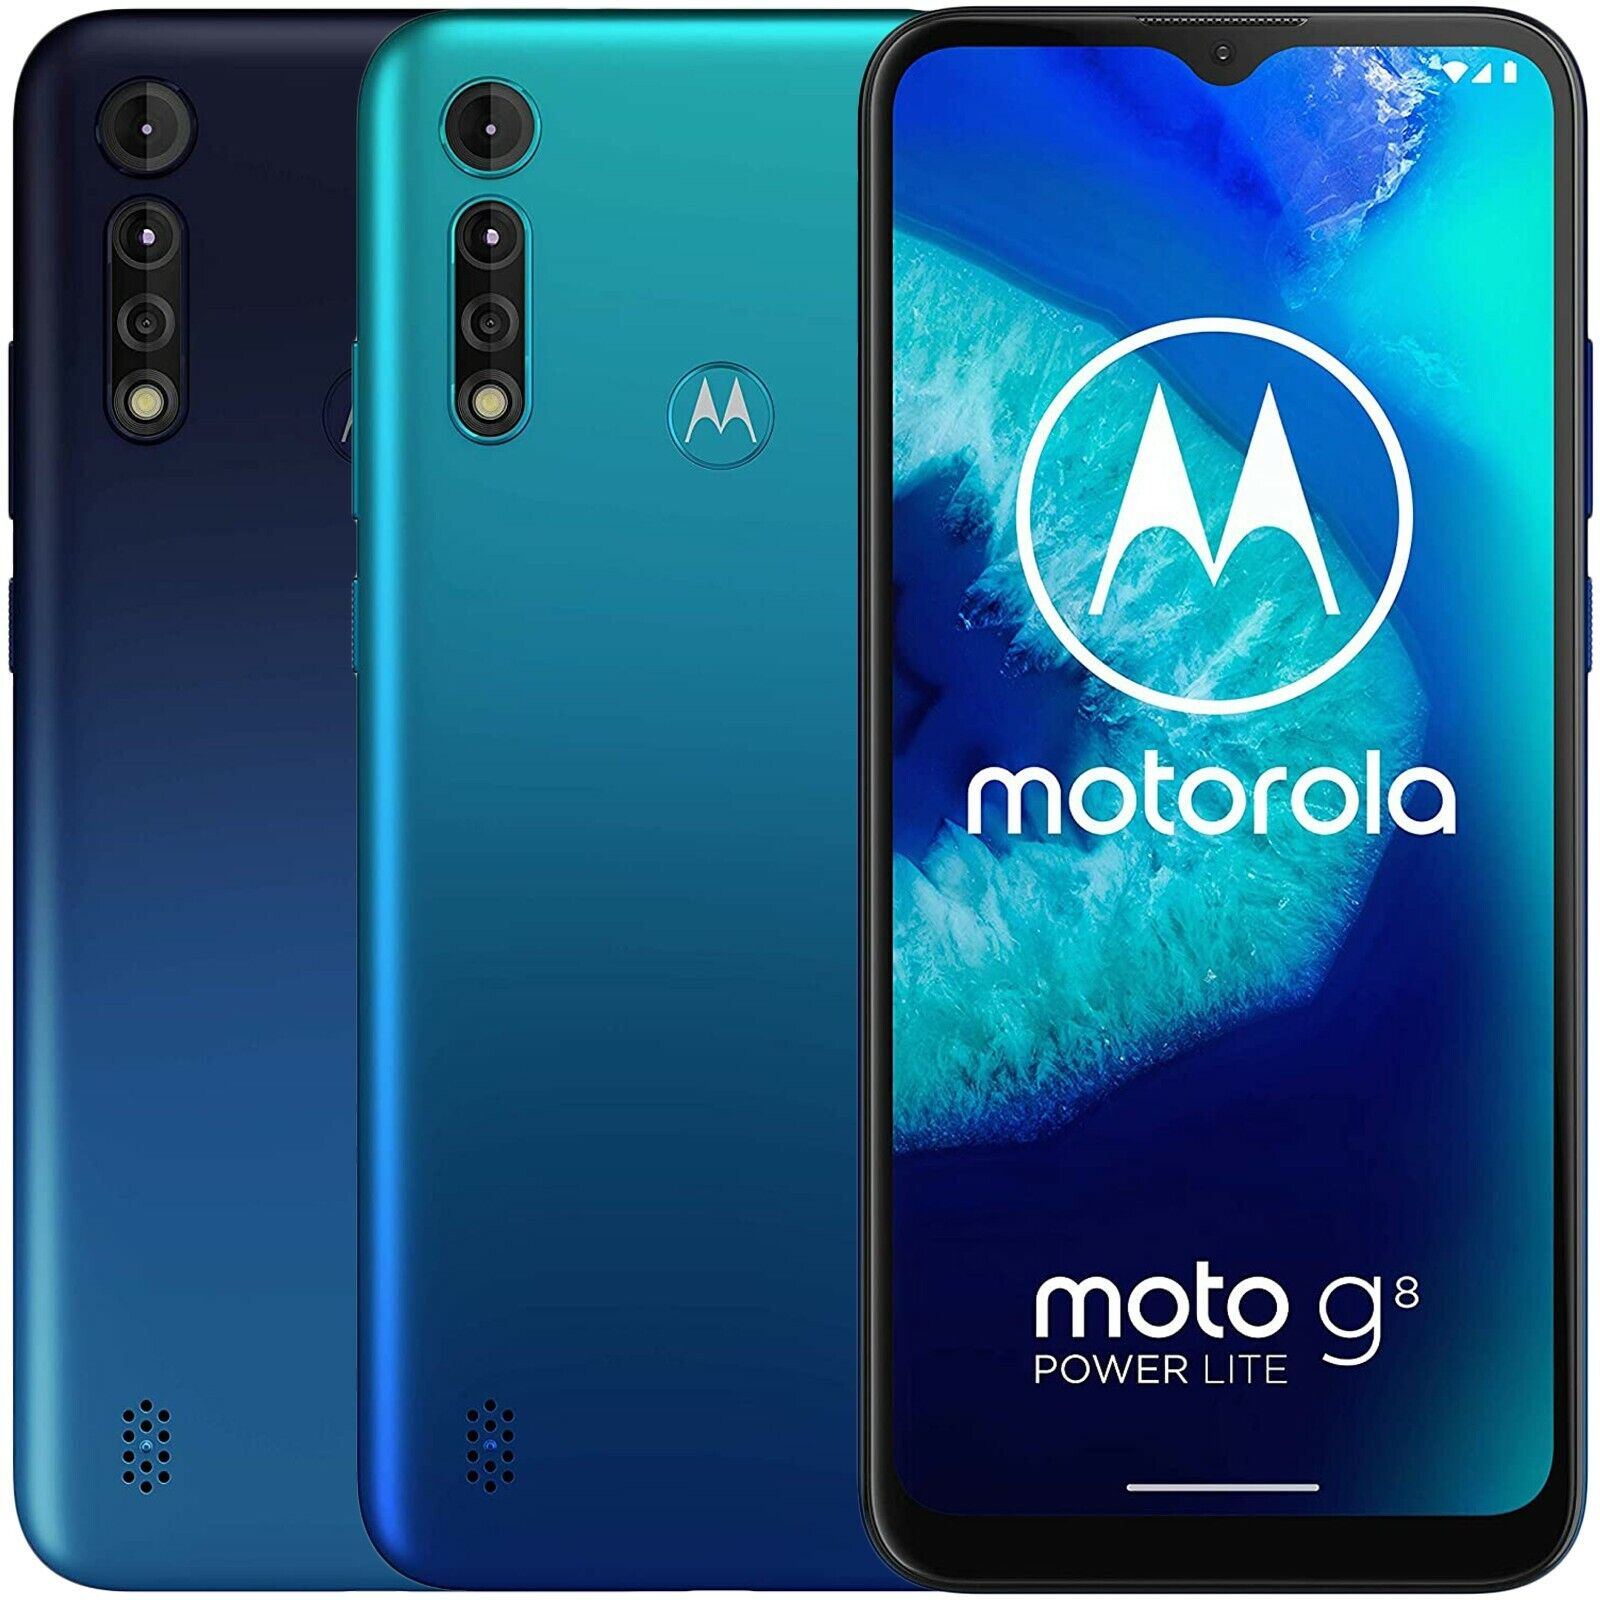 Motorola Moto G8 Power Lite XT2055-2 64GB 4GB RAM (FACTORY UNLOCKED) 6.5